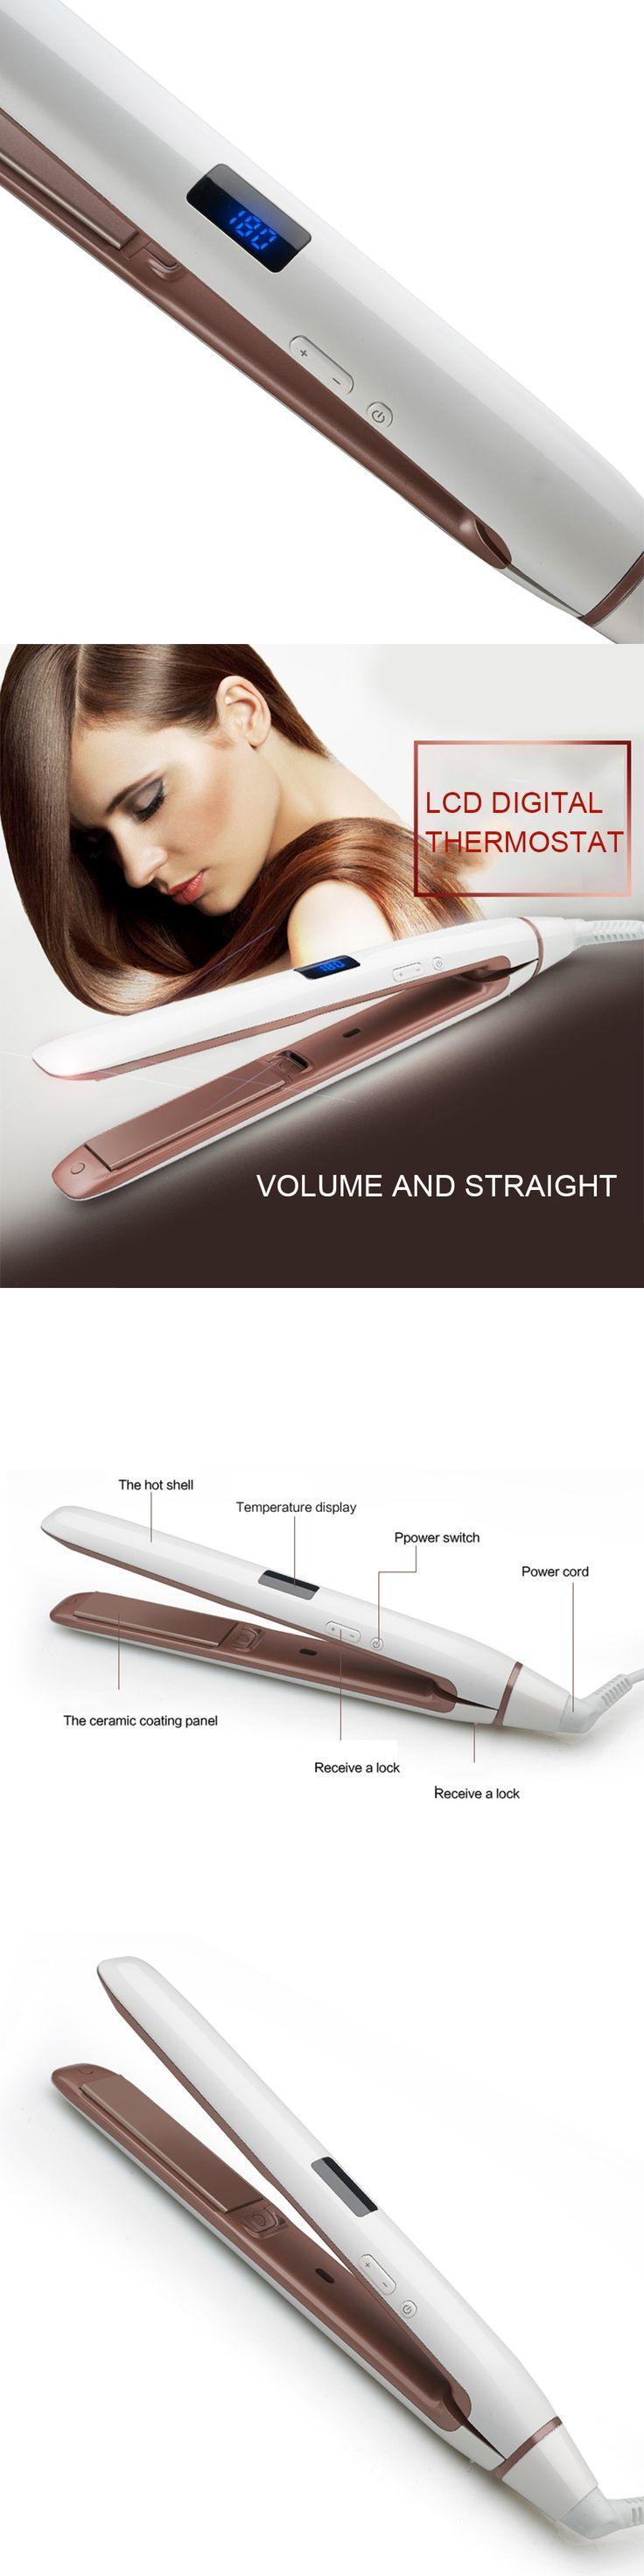 Multifunctional Hair Straightener Curling Iron Electric Hair Curler Flat Ceramic plate Hair straightening LCD digital thermostat